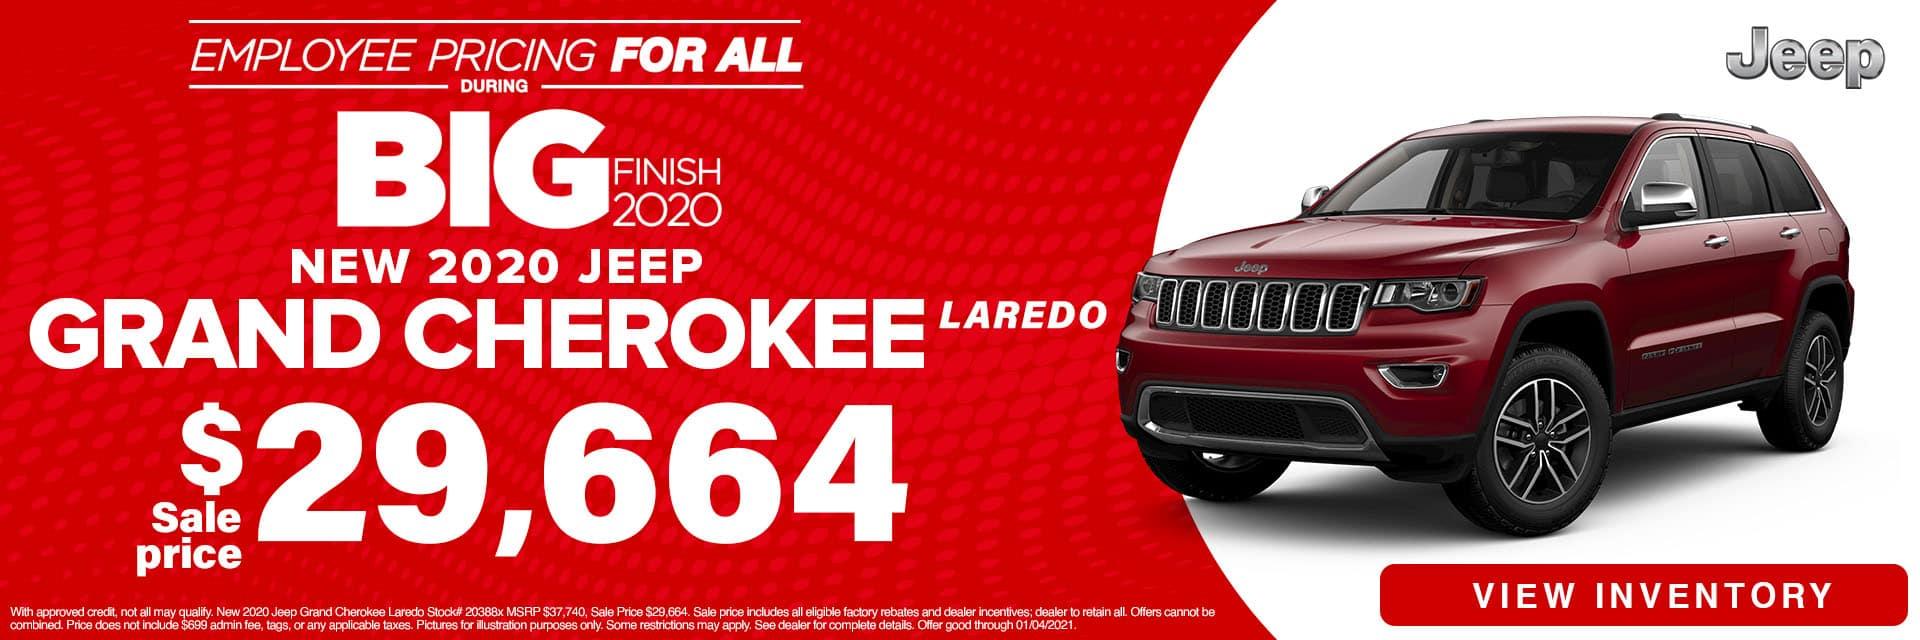 CLGO-December 2020-2020 Jeep Grand Cherokee